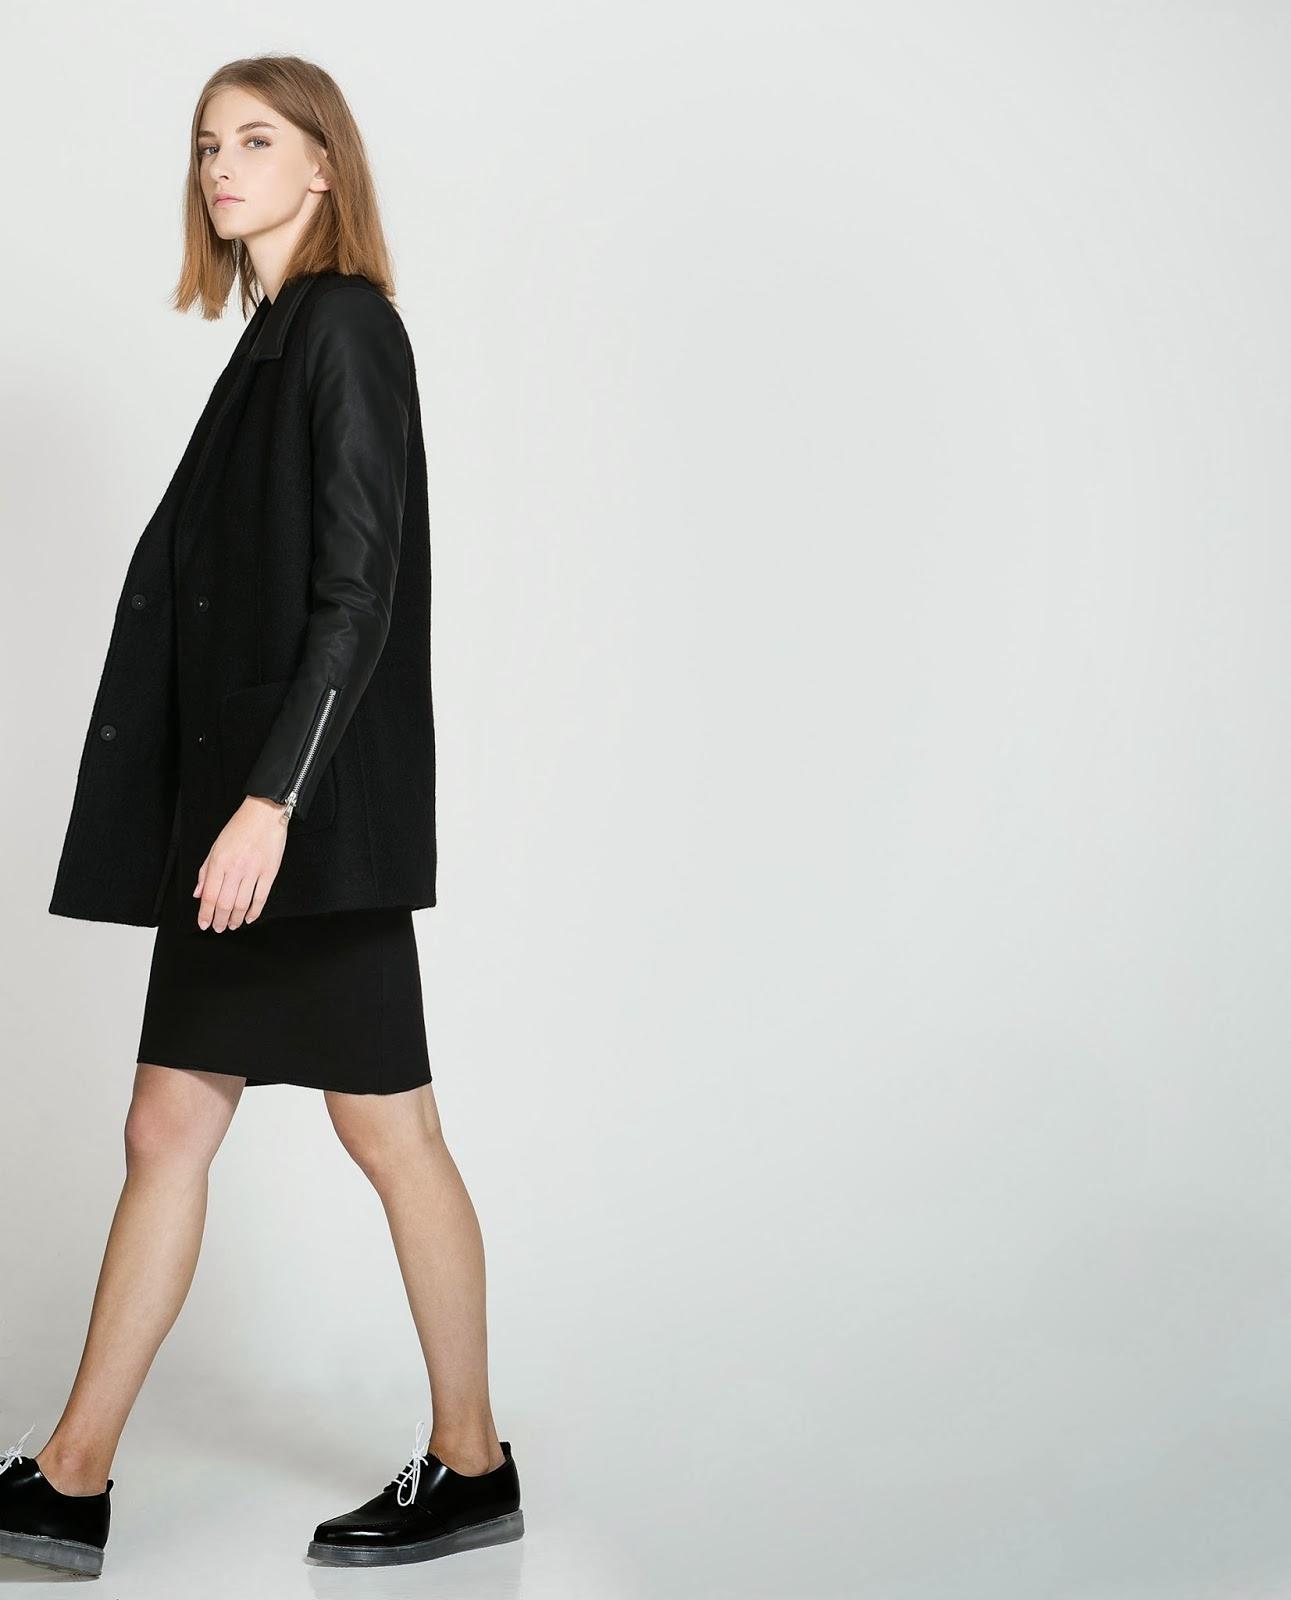 Dress Zara Fall Winter 2014 Coats Models